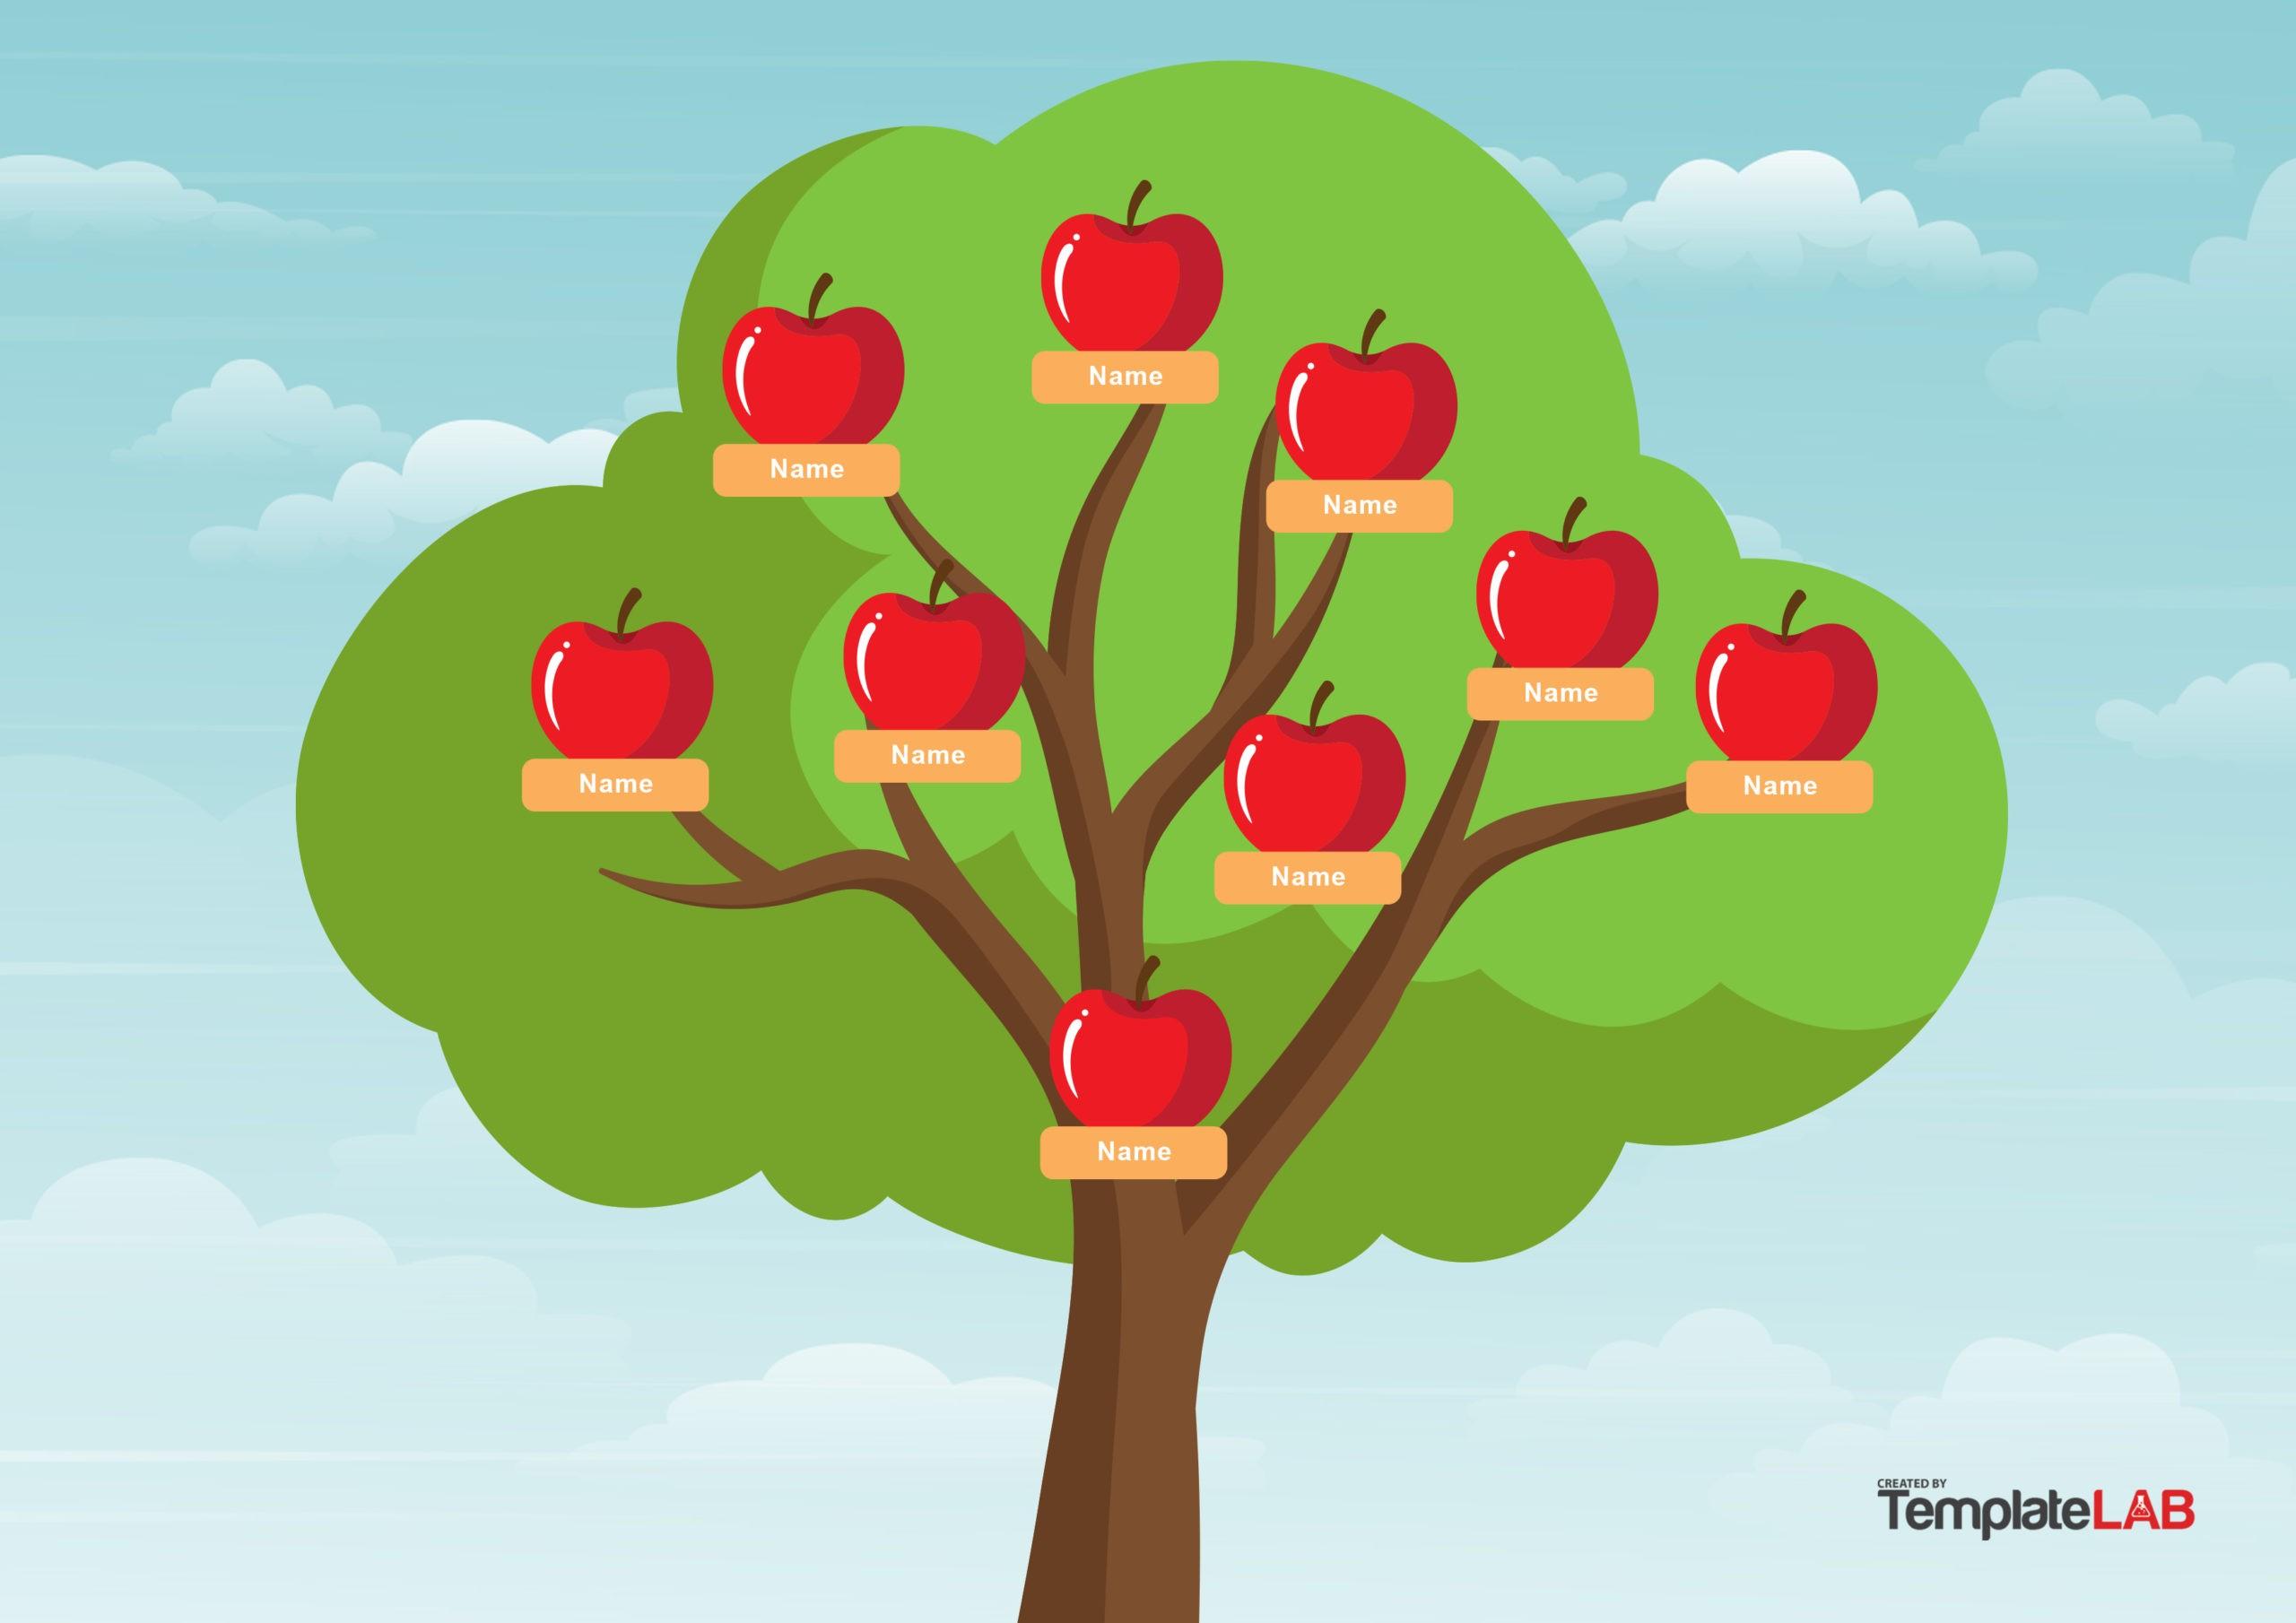 Free Family Tree Template 14 - TemplateLab.com